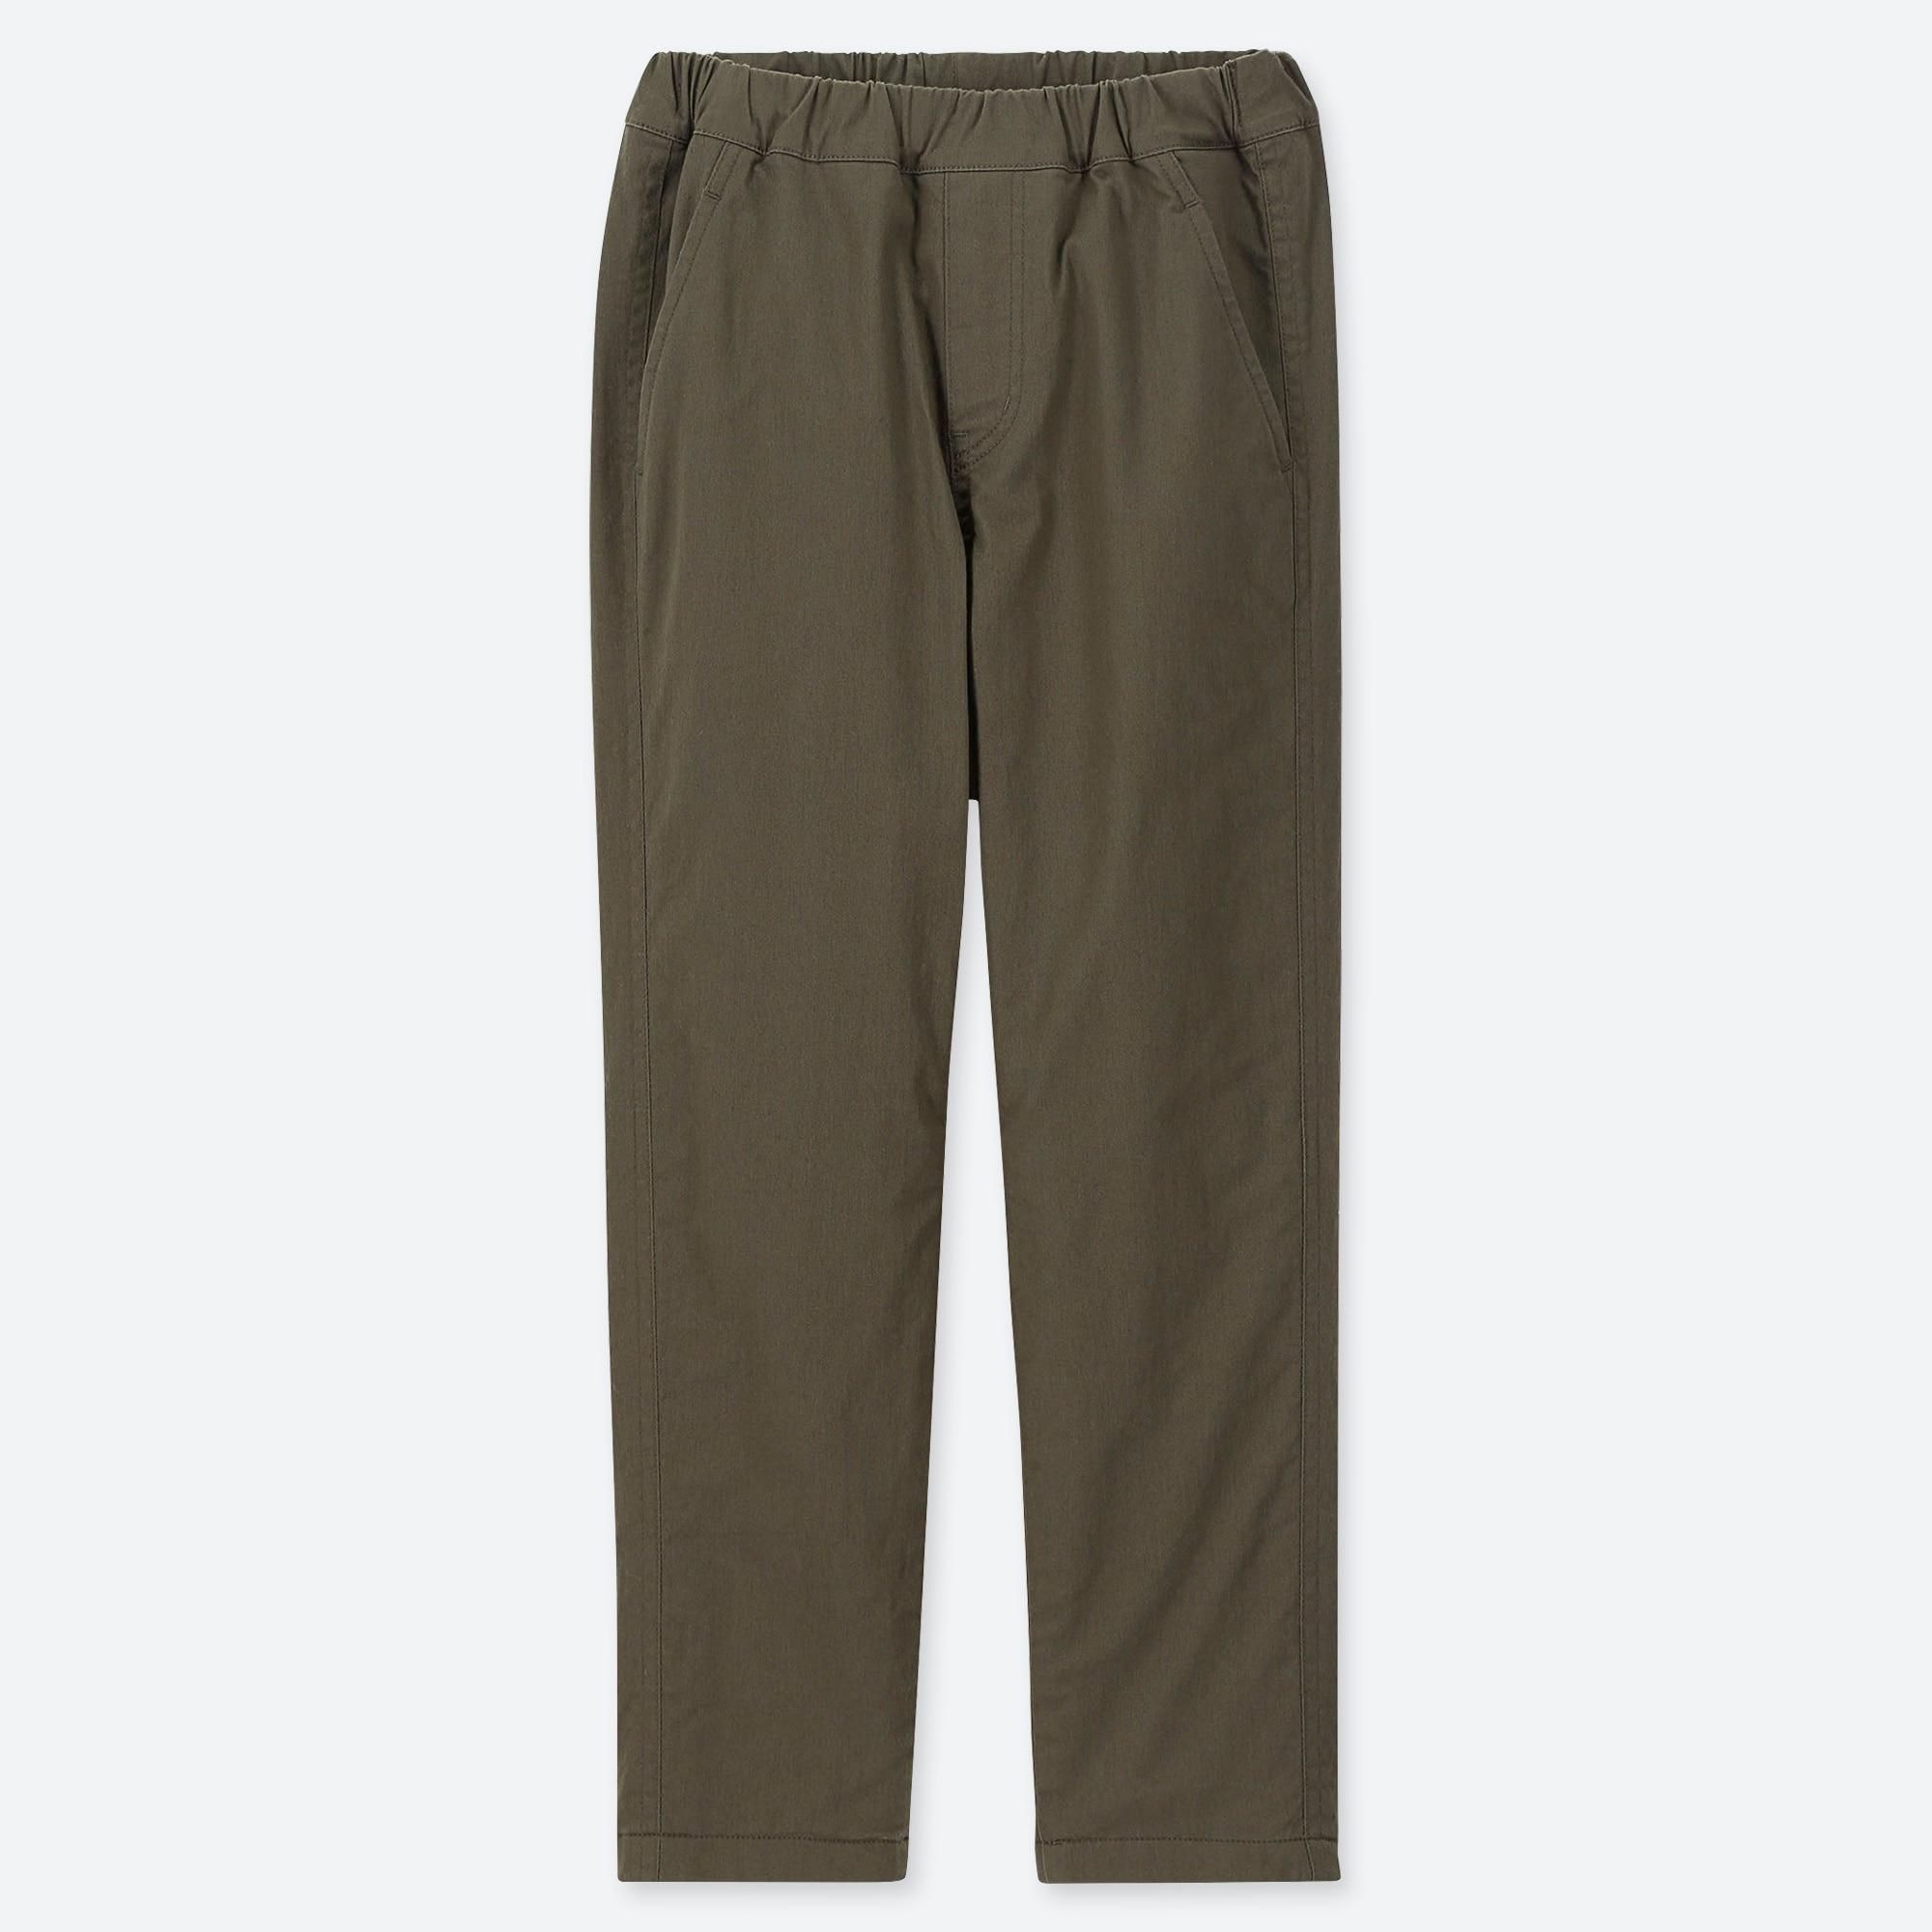 KIDS STRETCH WARM-LINED PANTS